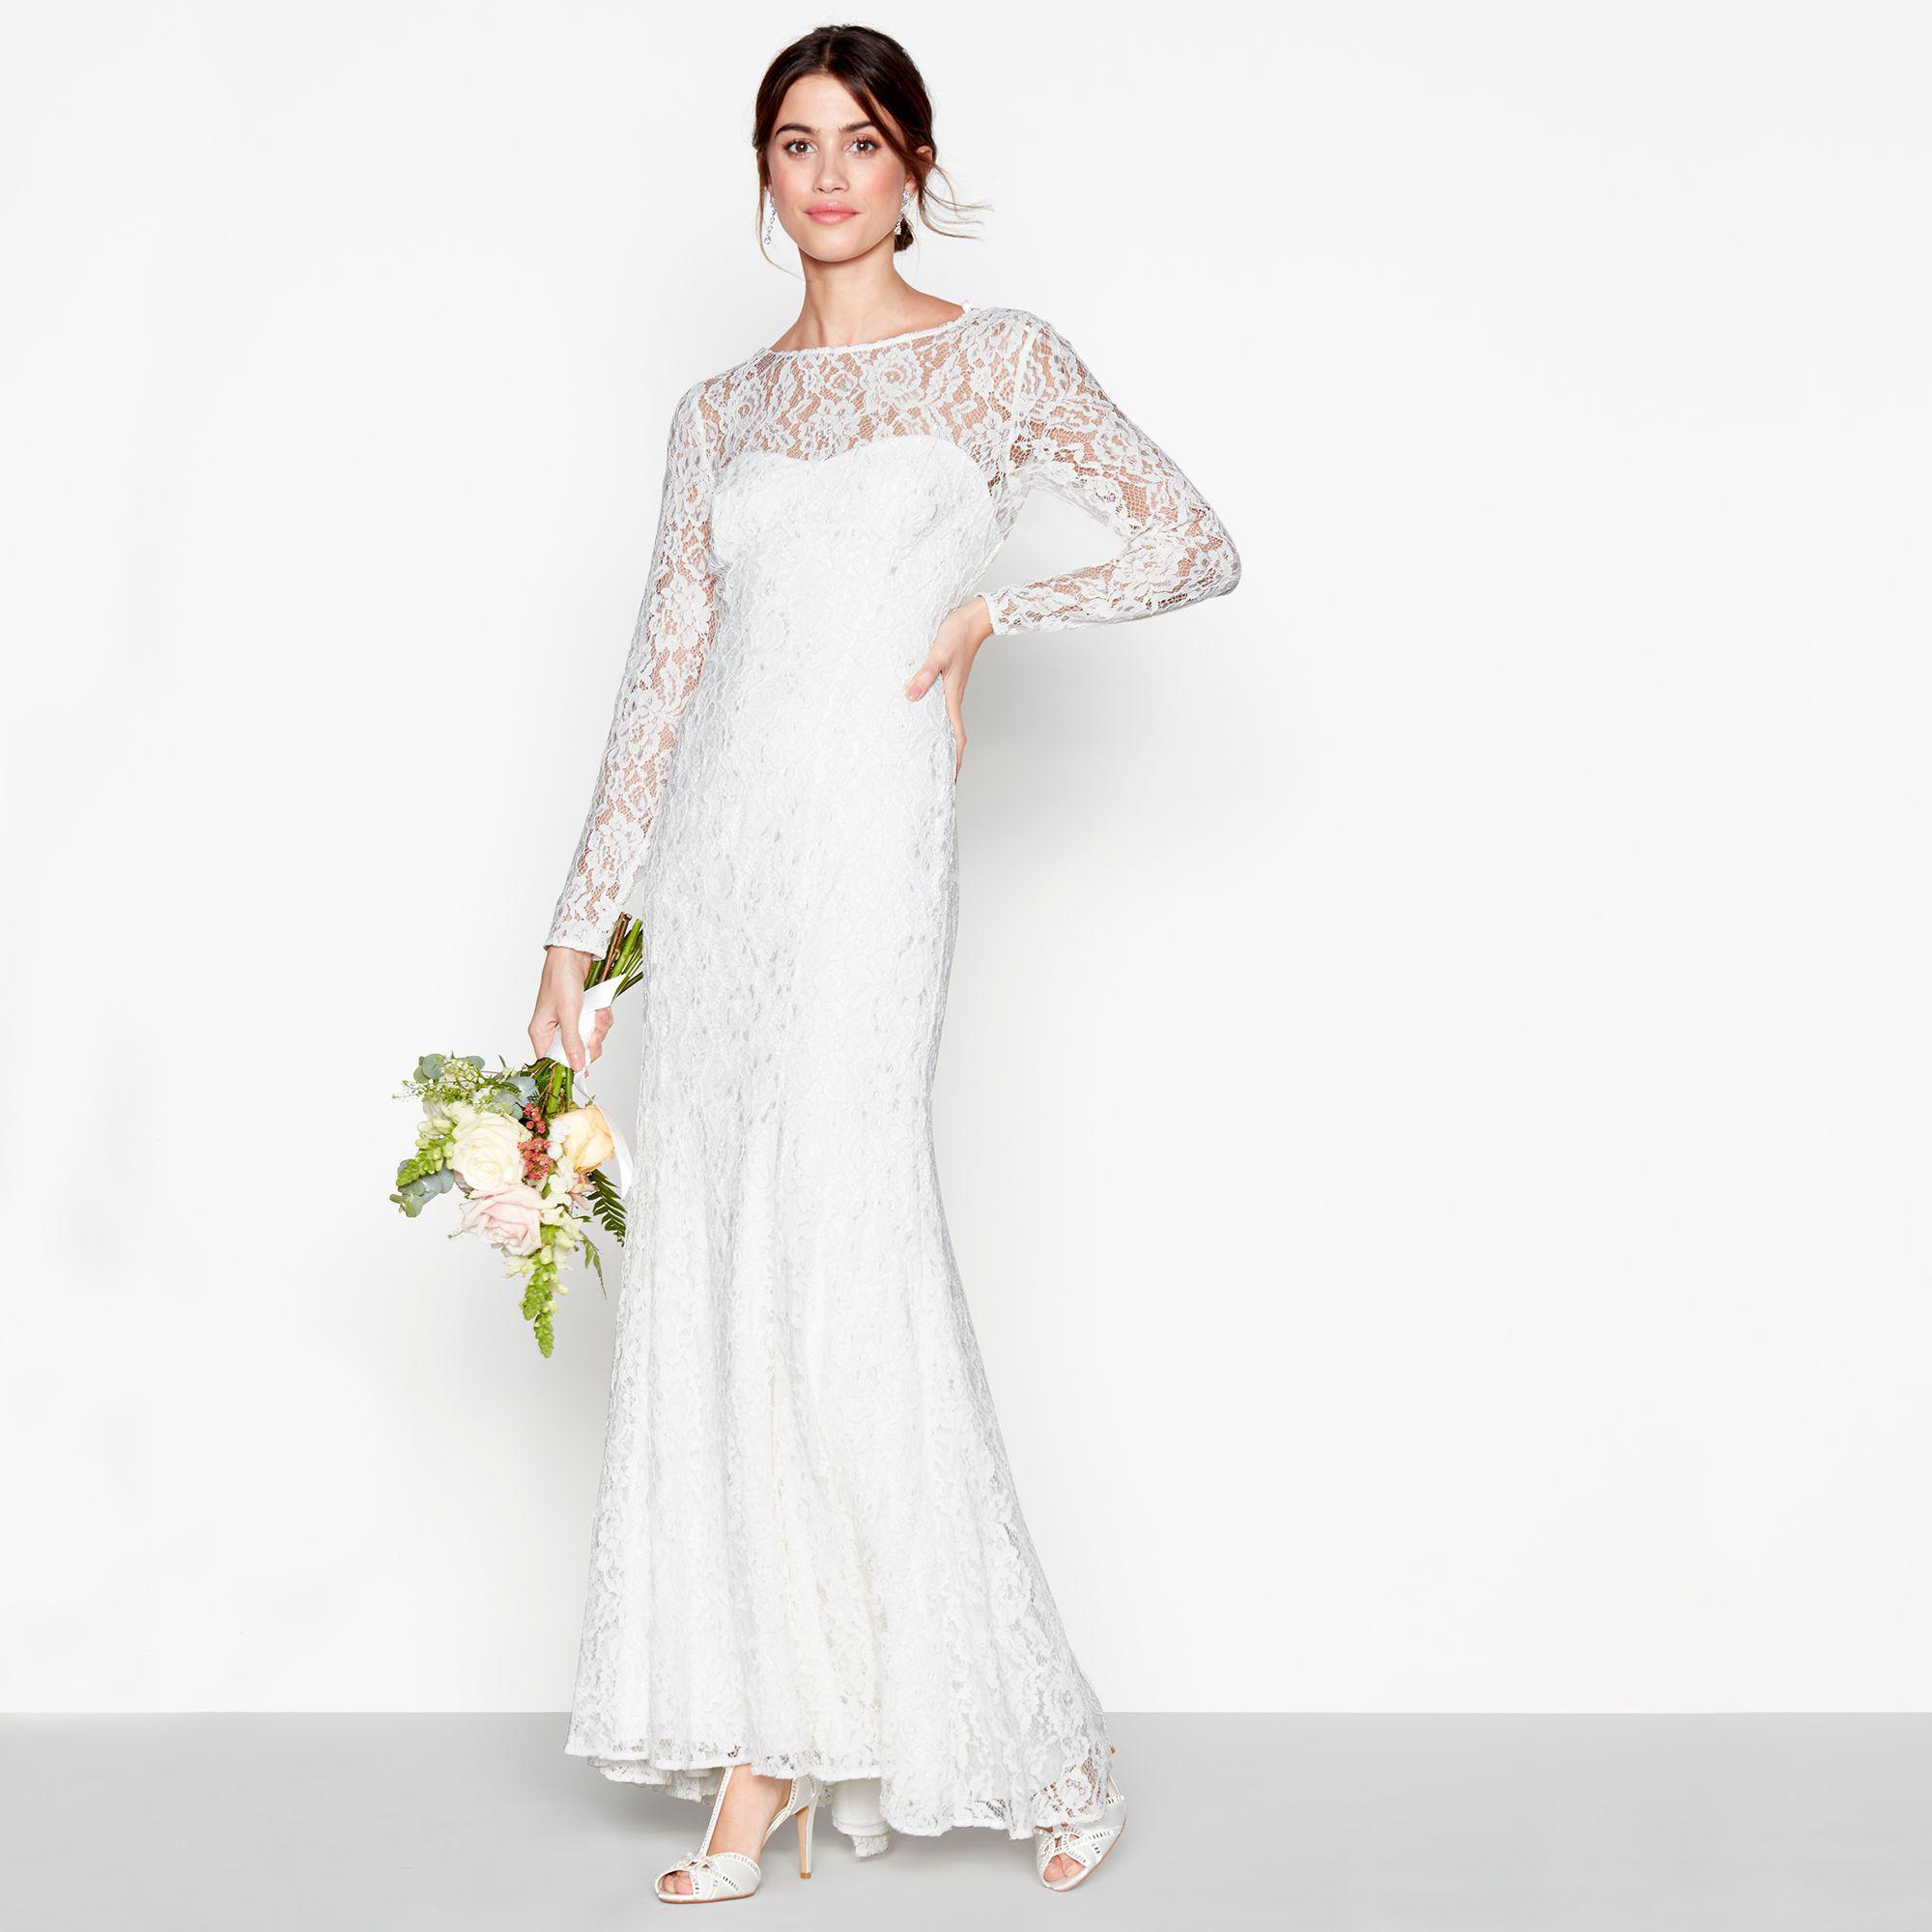 80b6e9b85c0a ... High Neck Long Sleeves Full Length Wedding Dress. Visit Debenhams. Tap  to visit site